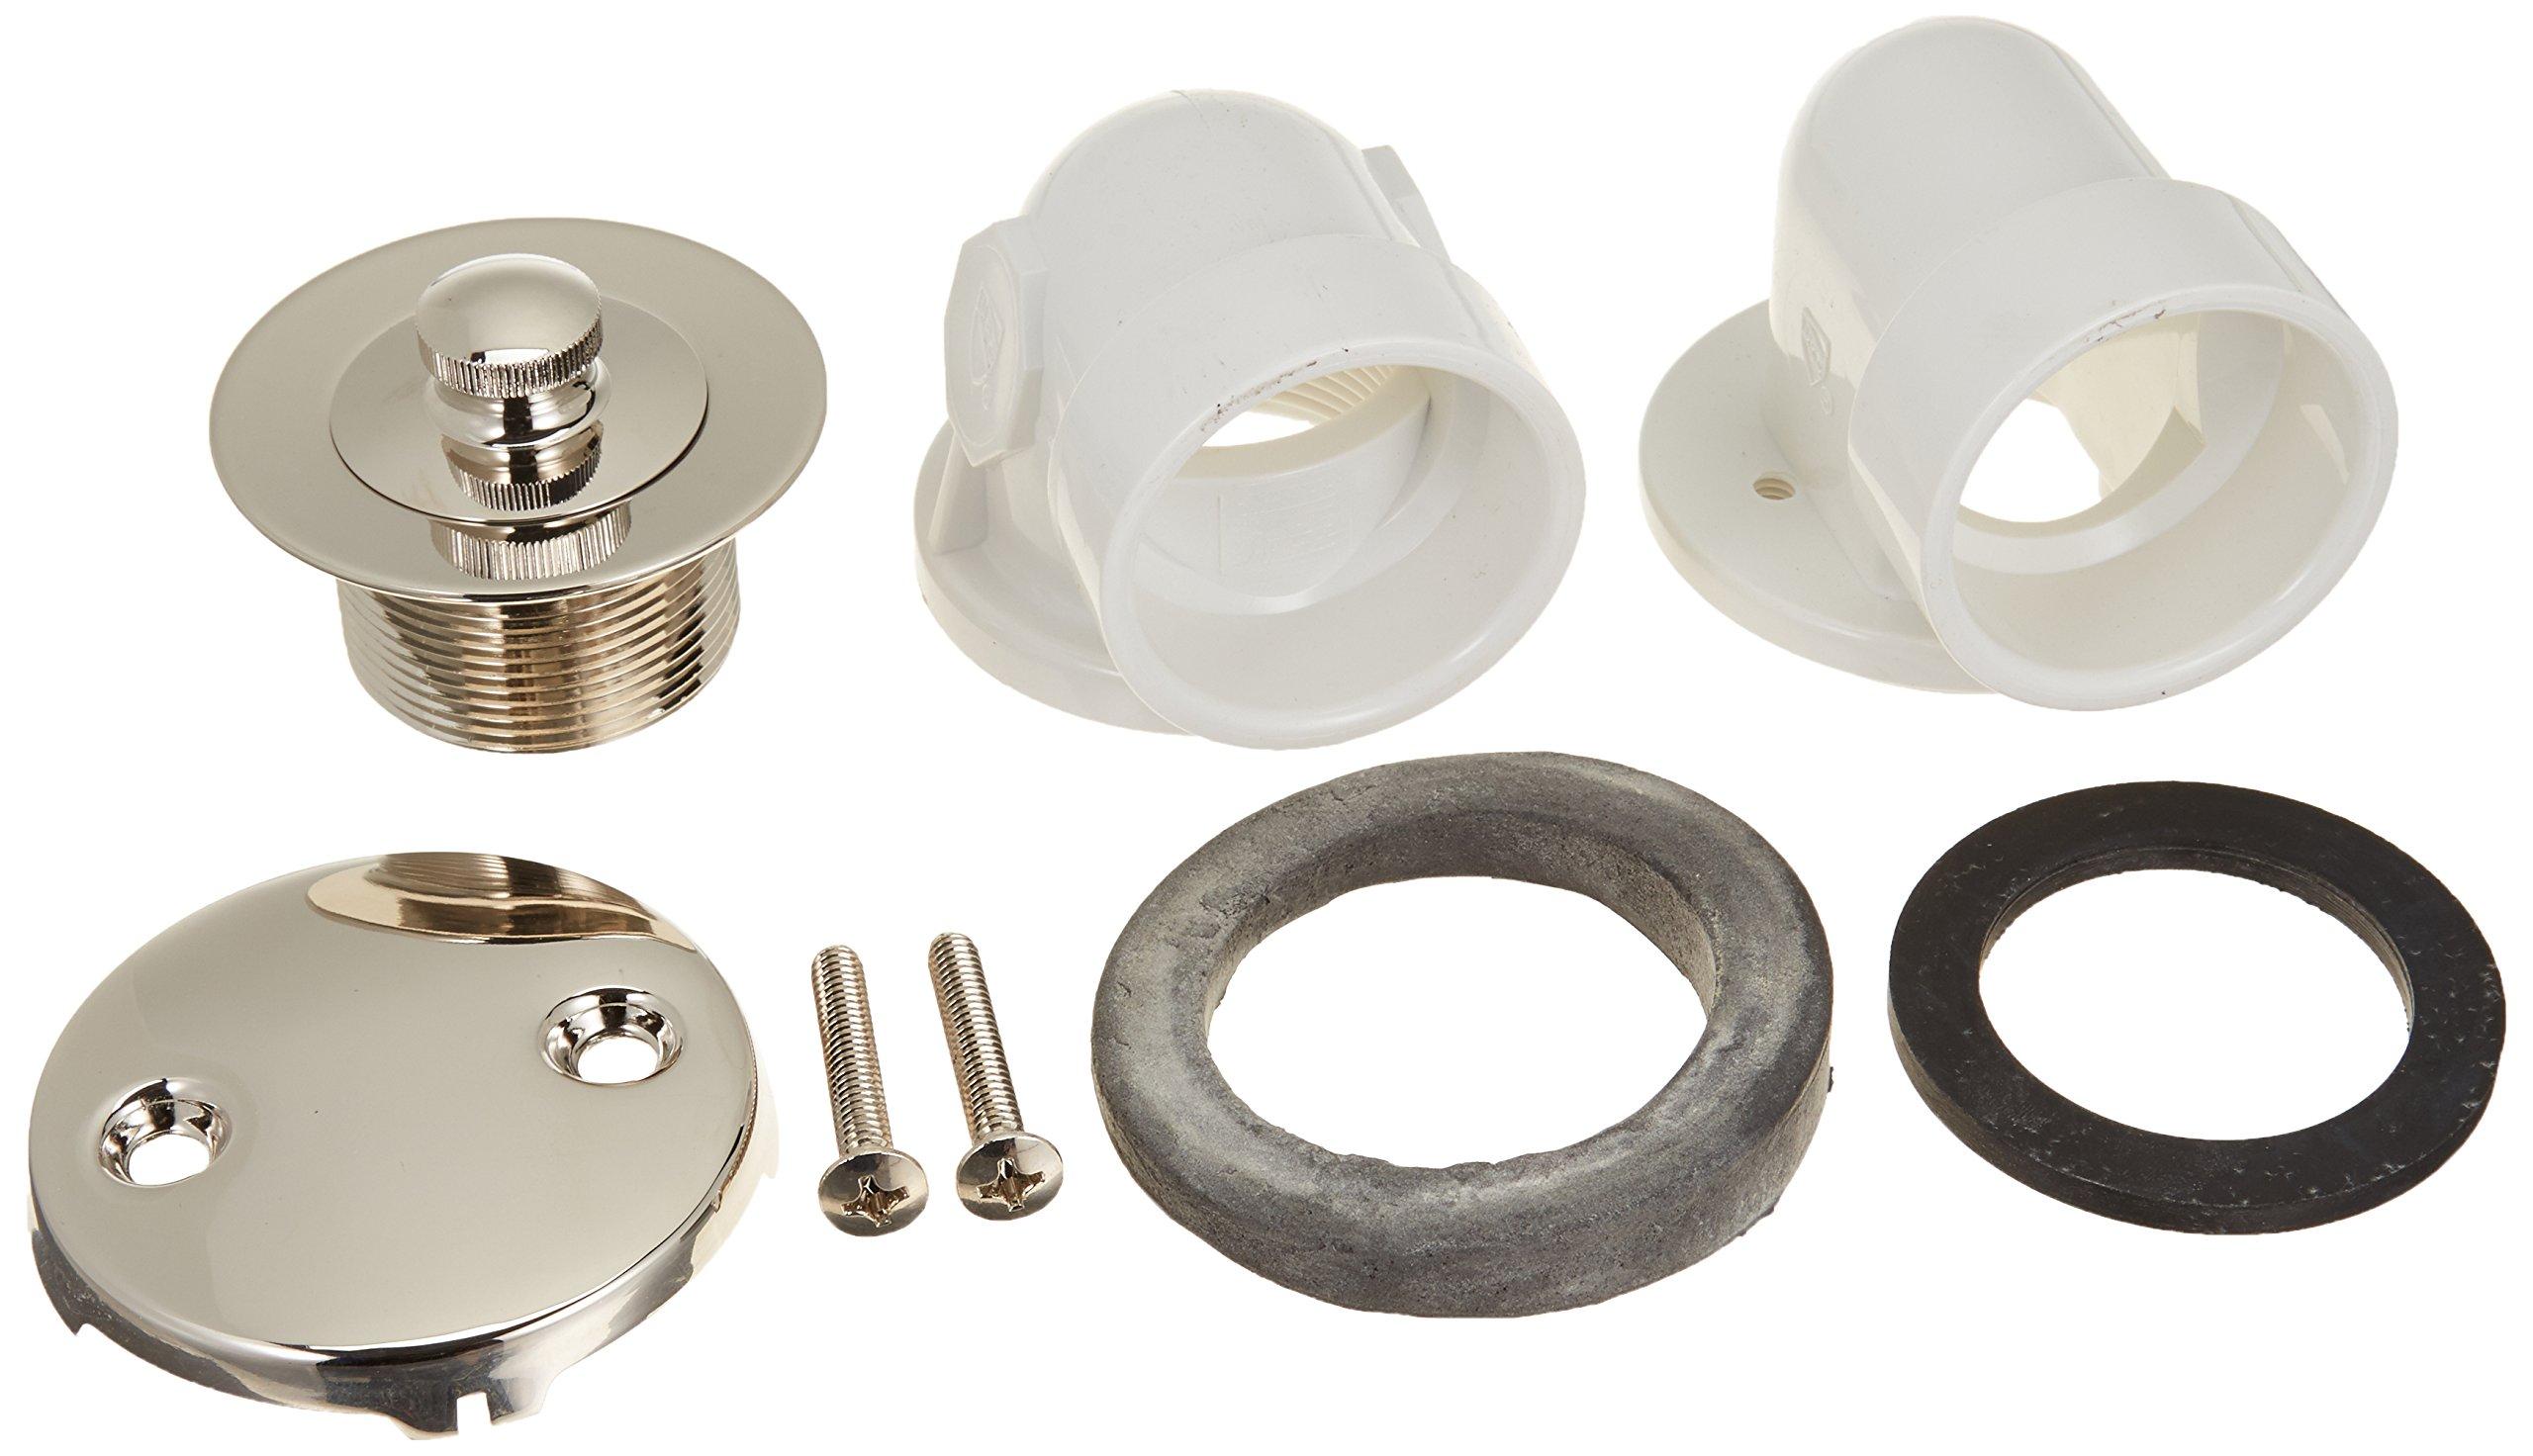 Jones Stephens B0711PN Polished Nickel PVC Half Kit Lift and Twist